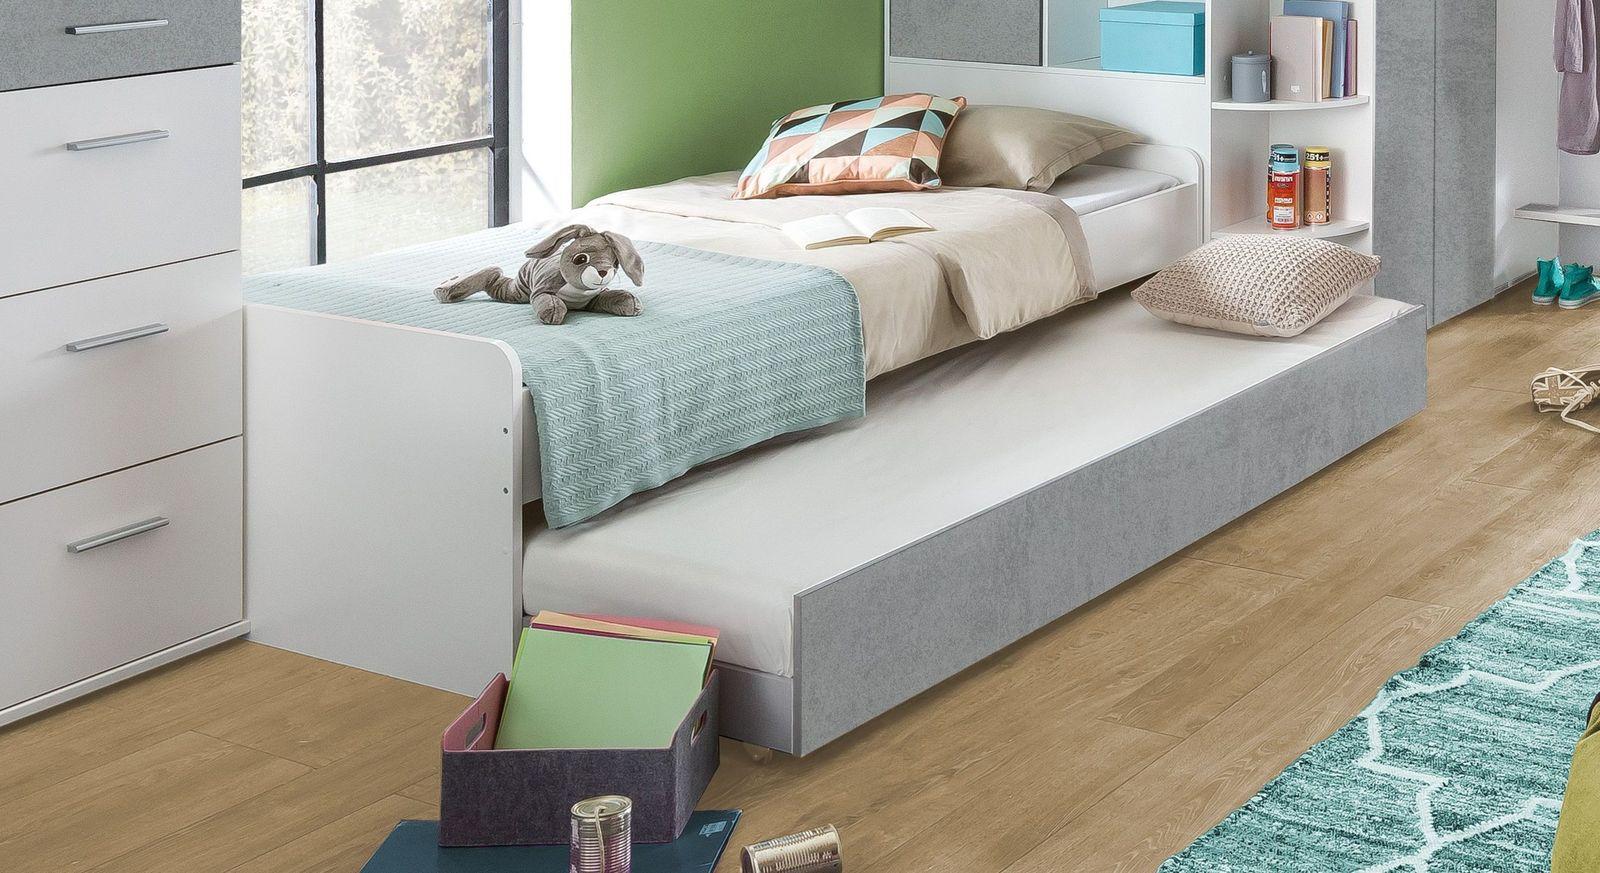 Jugendbett Porvenir mit herausziehbarer Bettschublade